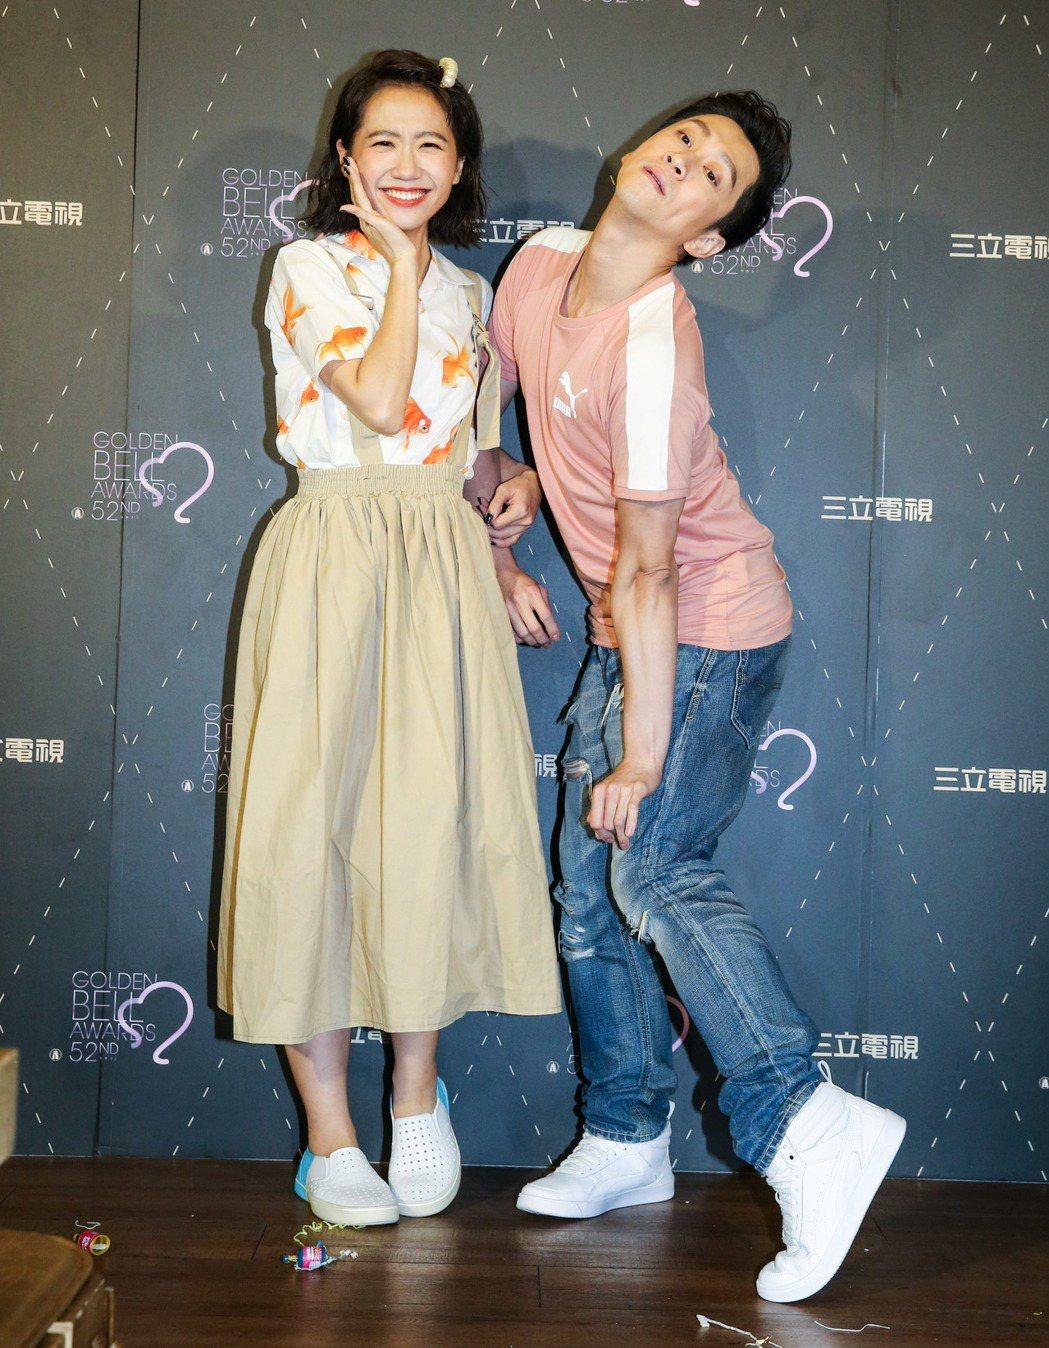 Lulu(左)和陳漢典(右)主持的「綜藝大熱門」今年錯失金鐘。記者鄭清元/攝影